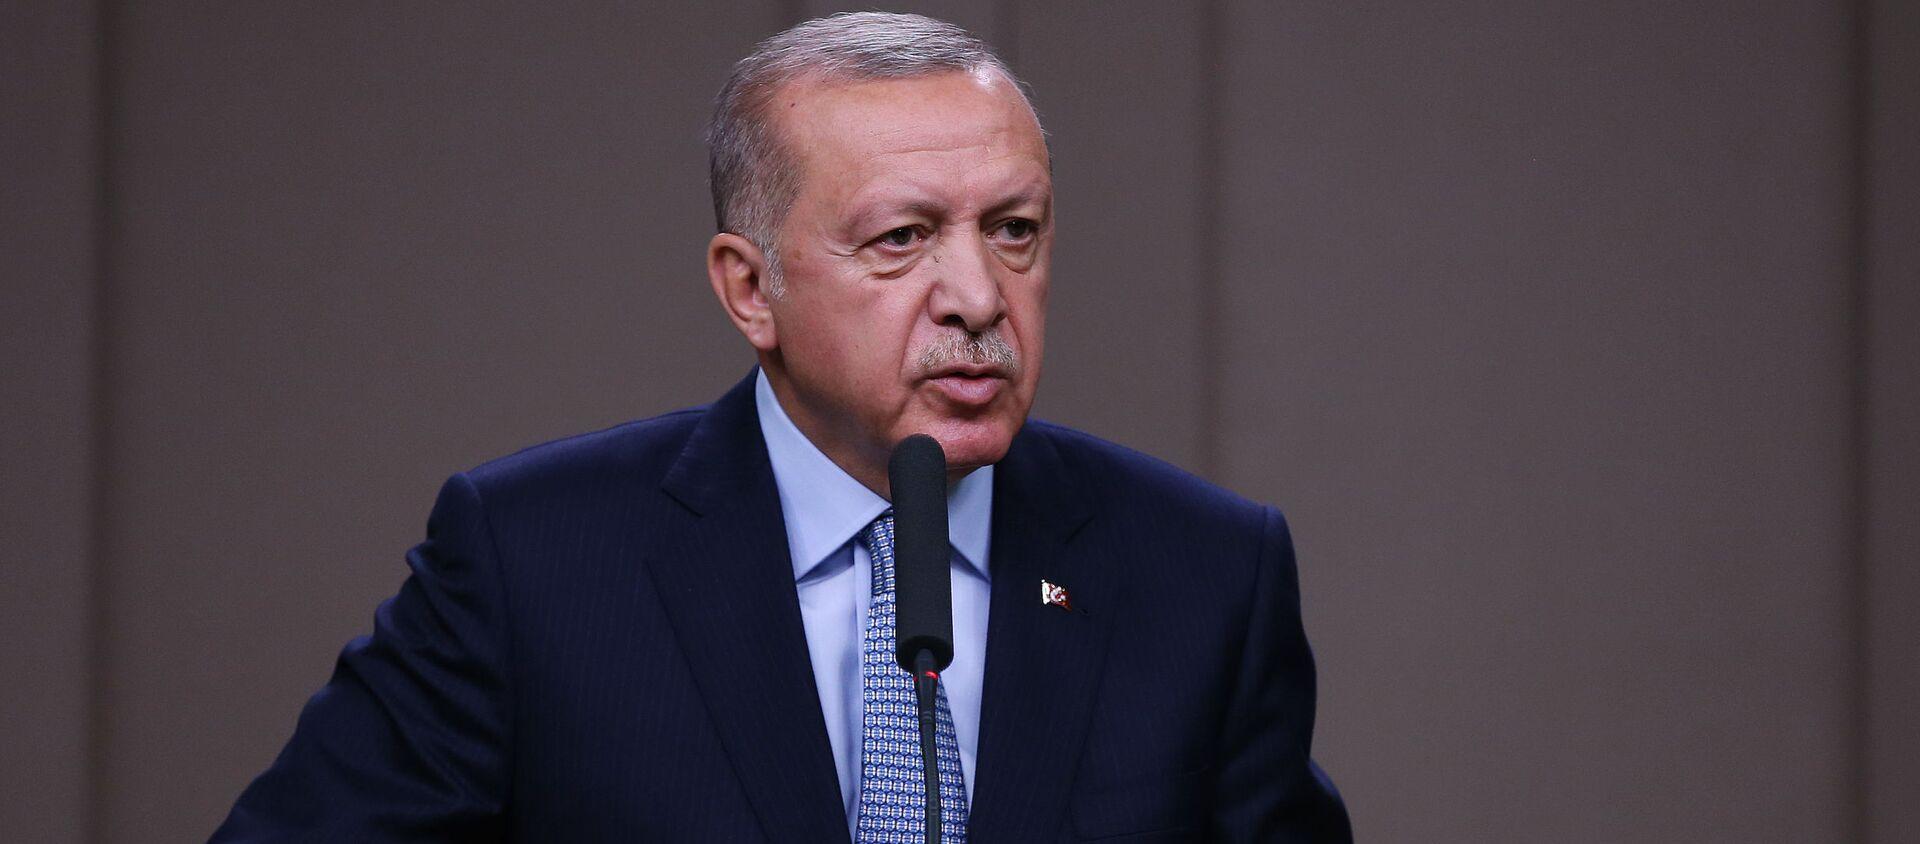 Президент Турции Реджеп Тайип Эрдоган, фото из архива - Sputnik Азербайджан, 1920, 04.03.2021